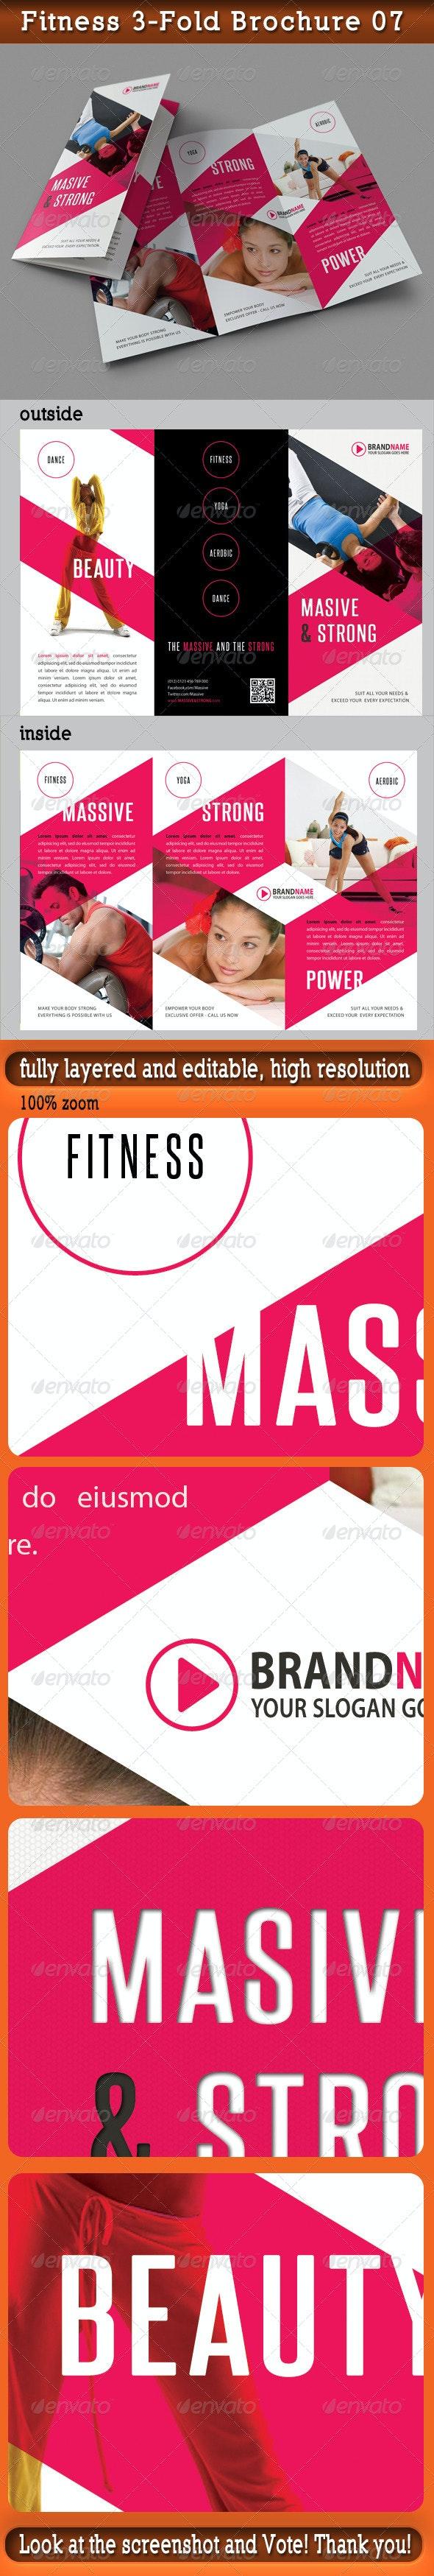 Fitness 3-Fold Brochure 07 - Catalogs Brochures